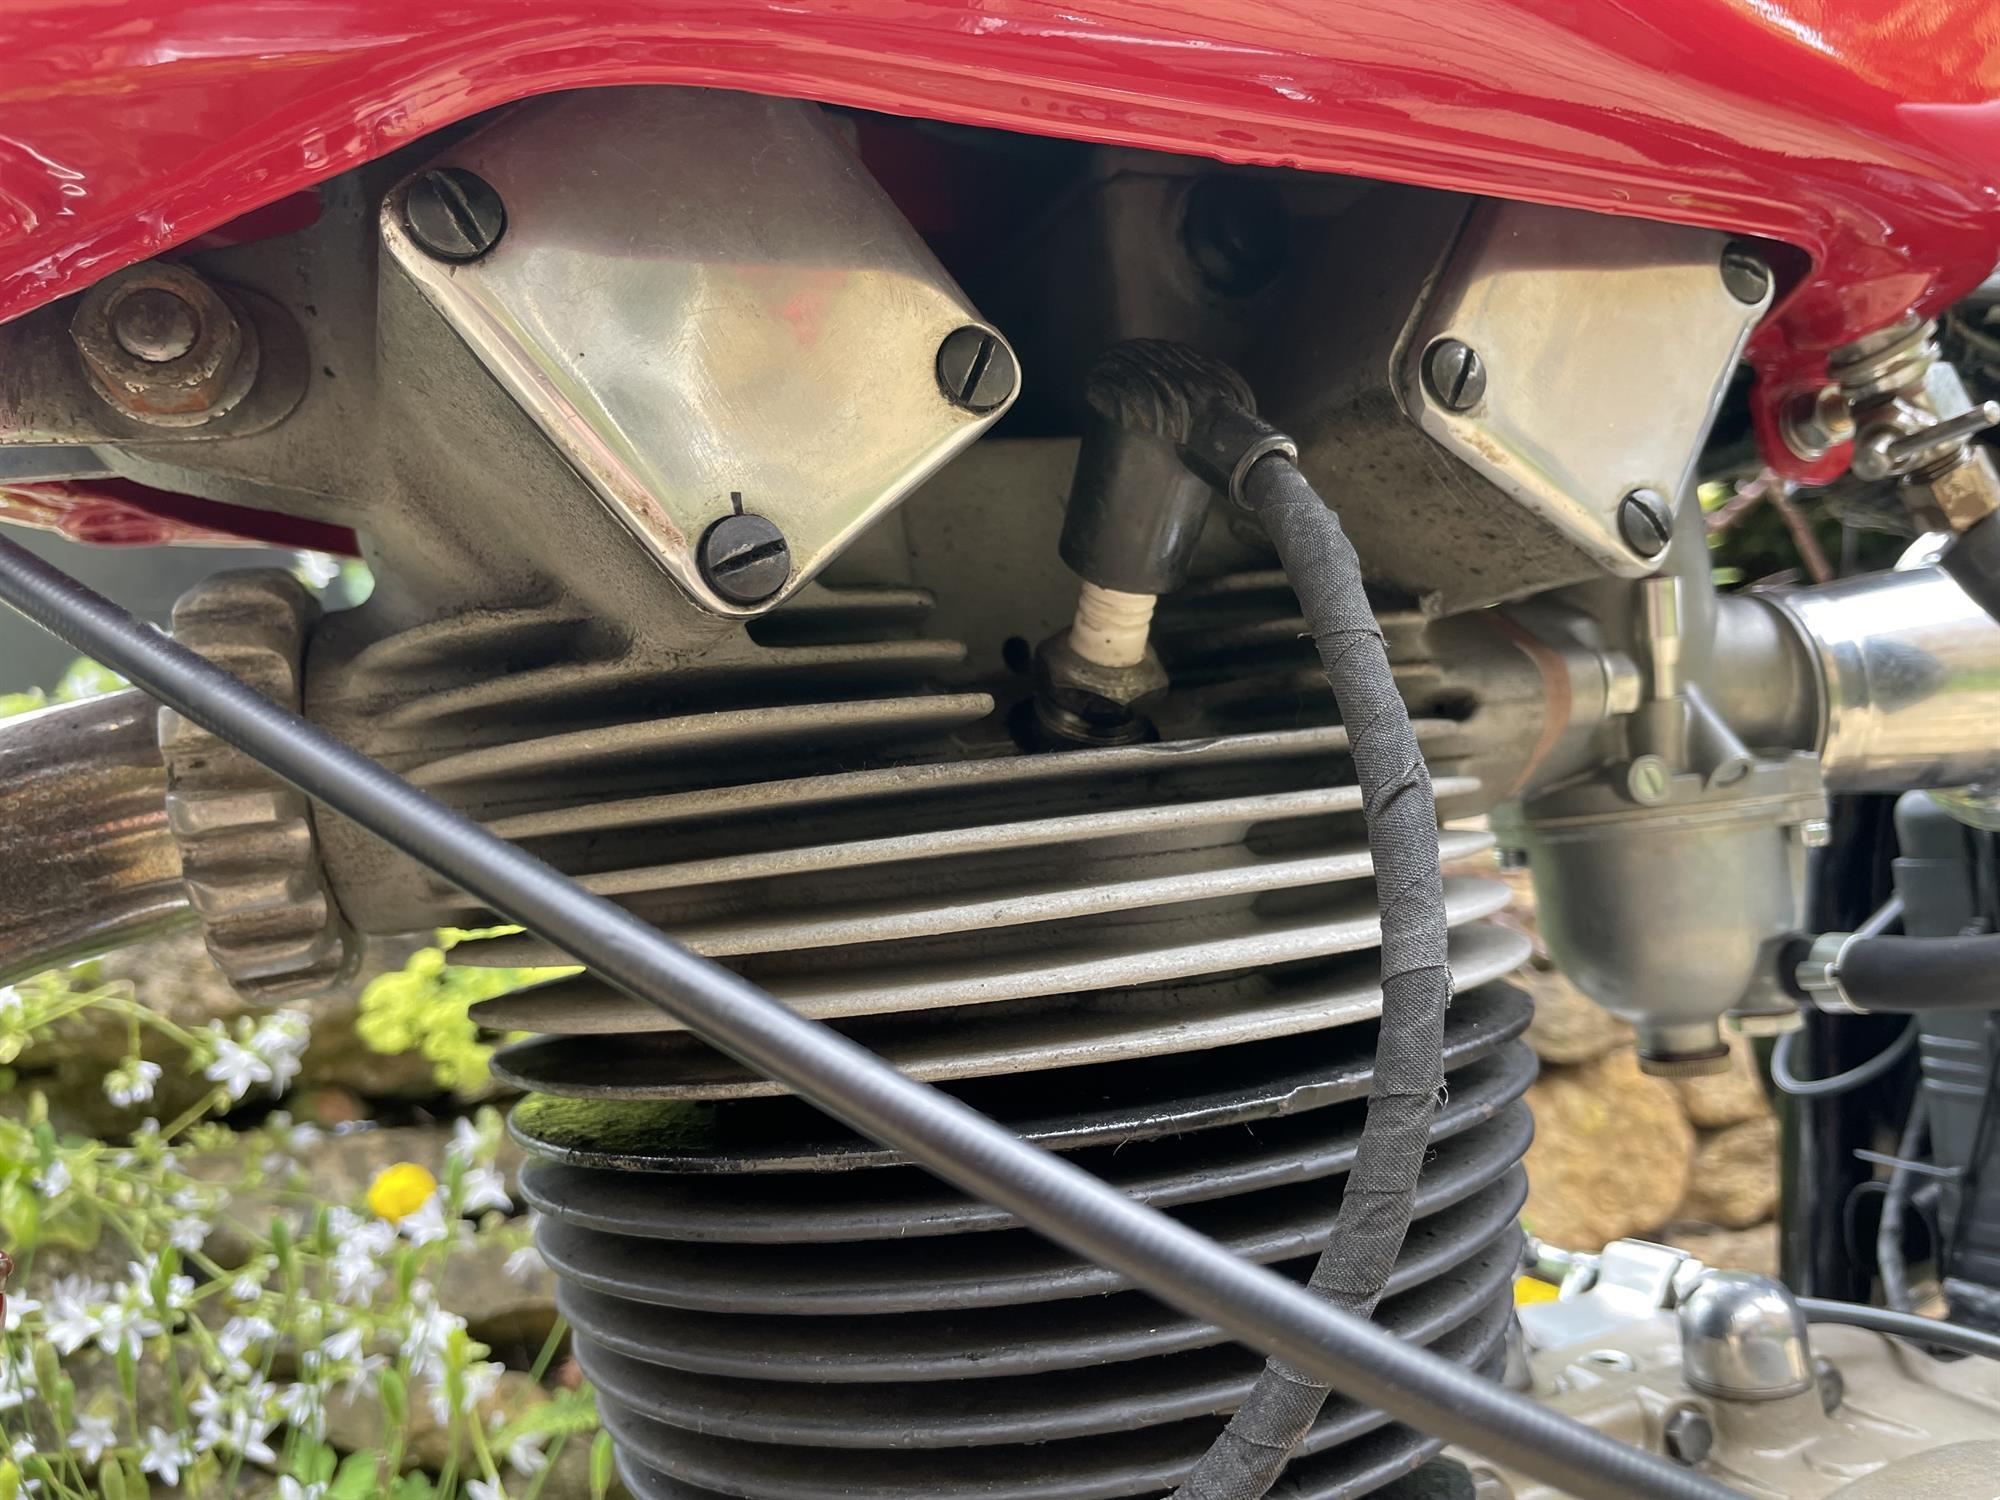 1954 Gilera Saturno Sport 500cc - Image 3 of 10